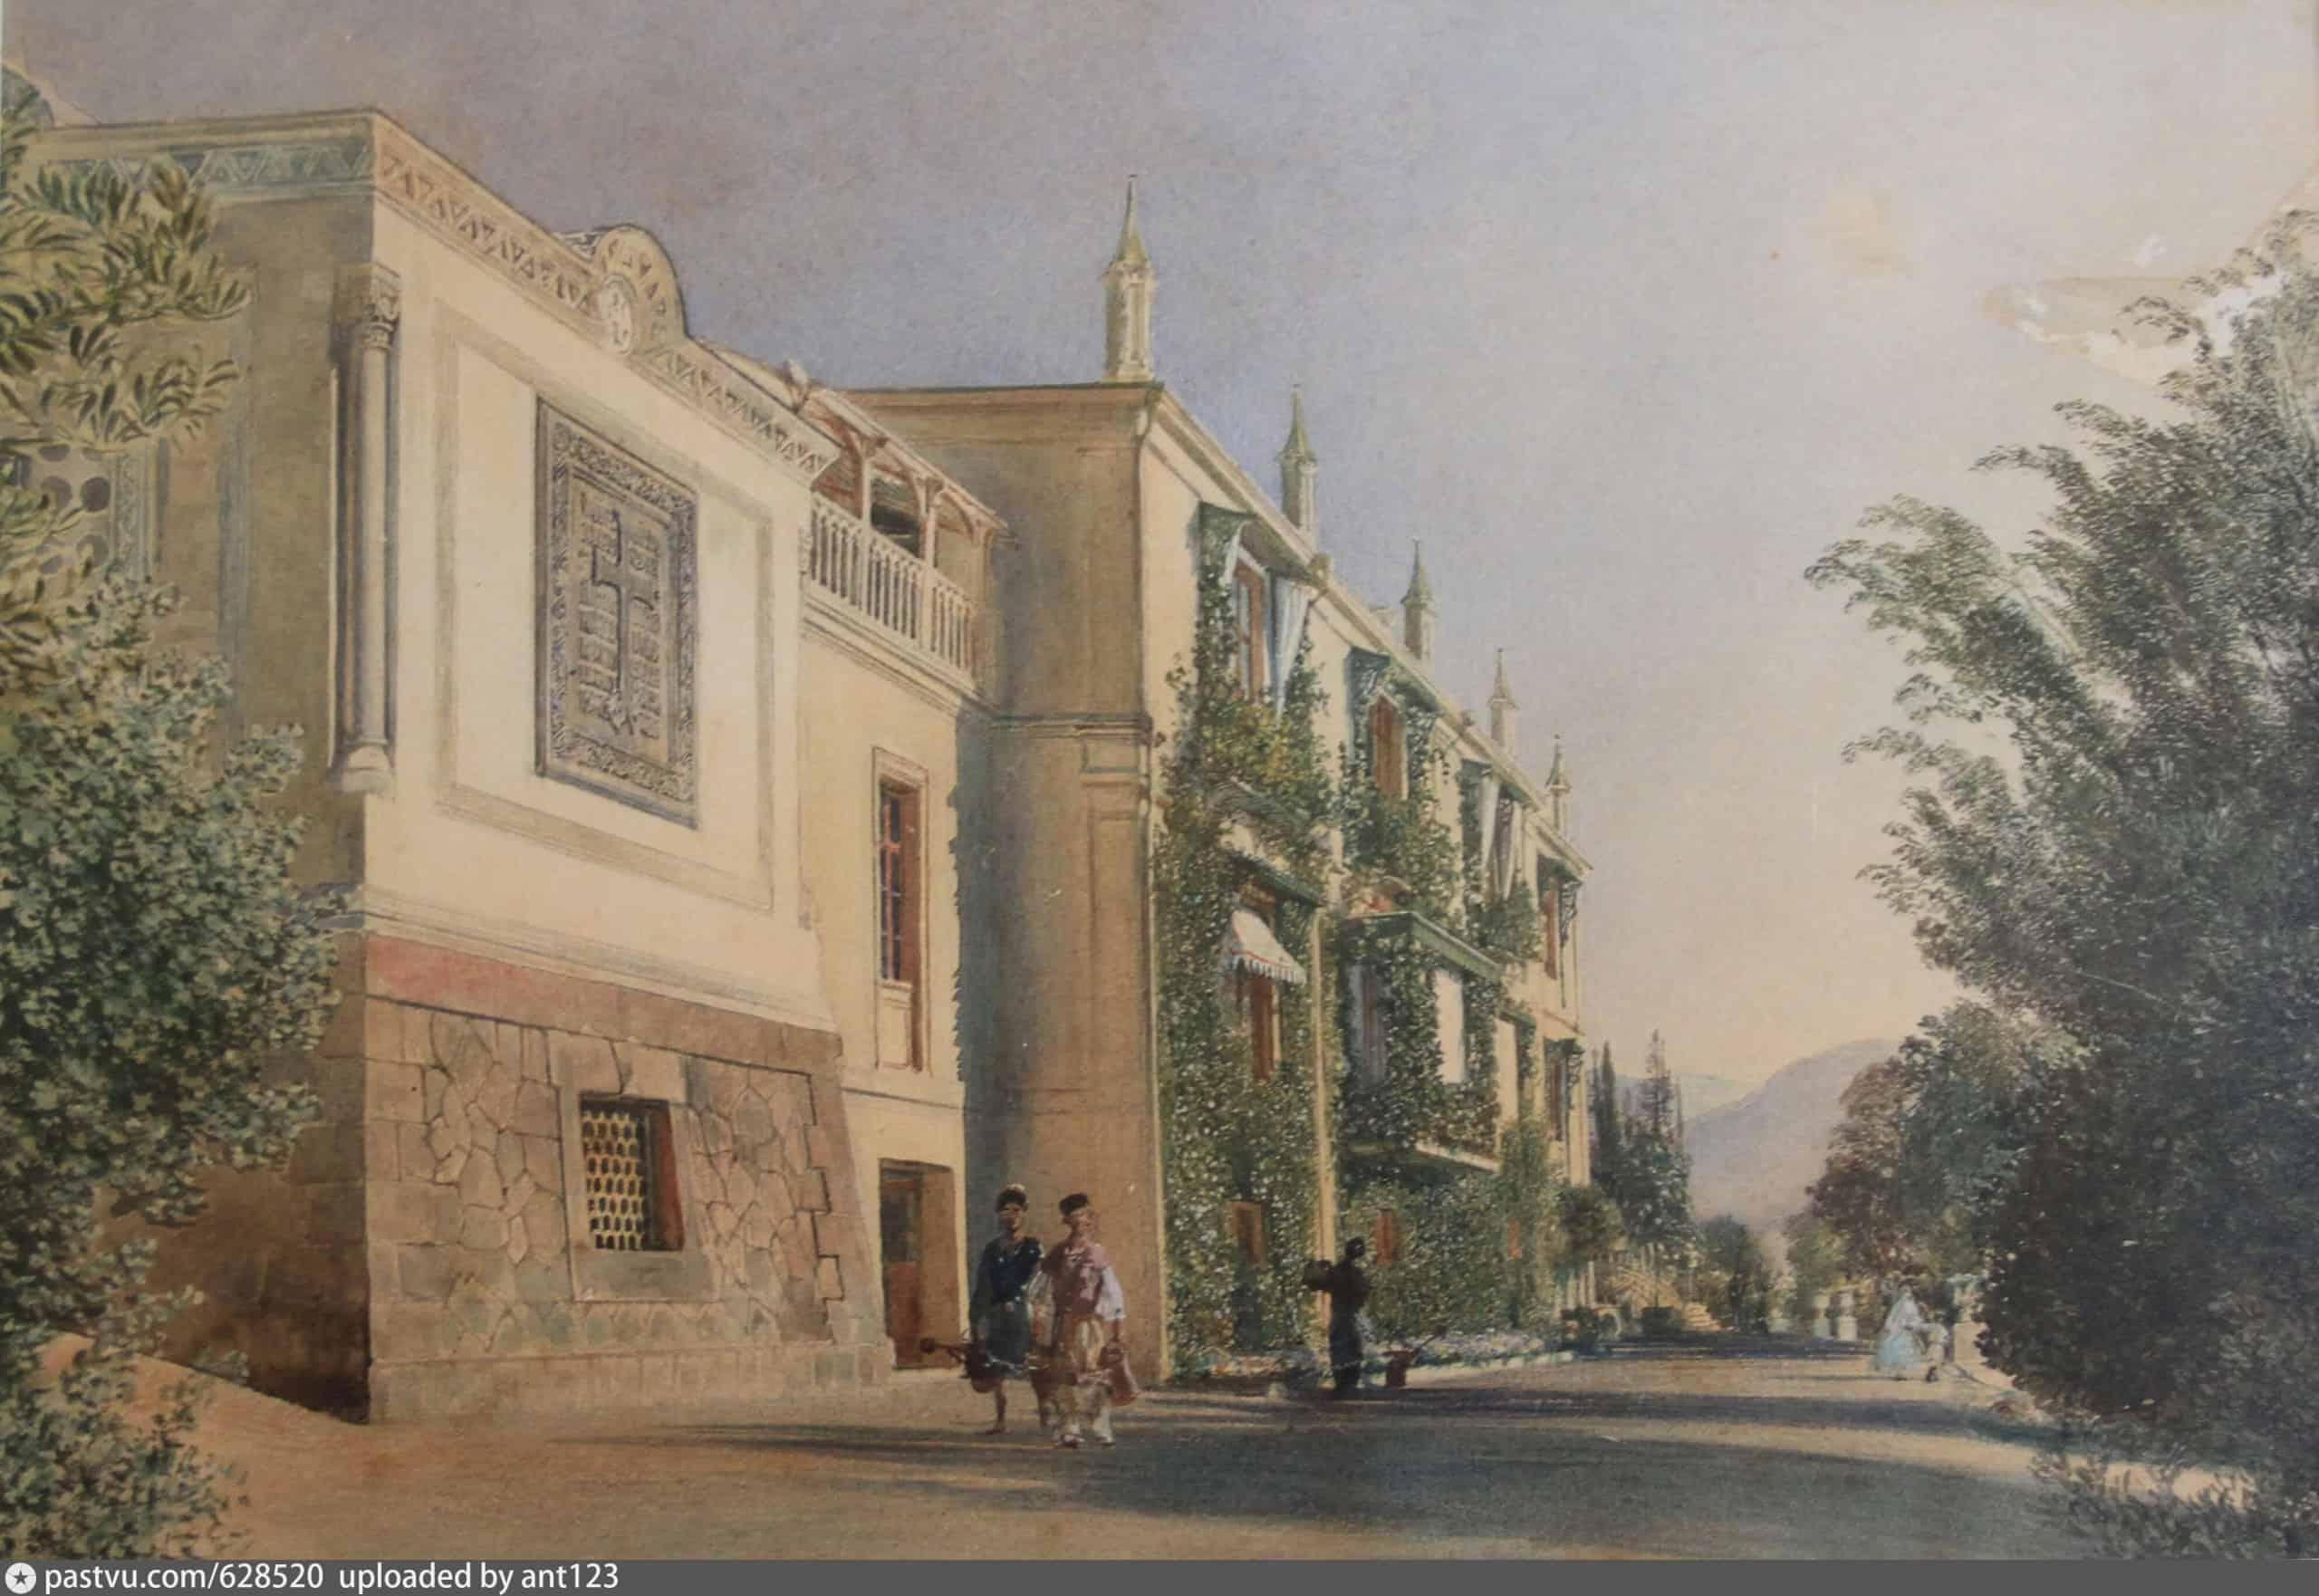 Р. фон Альт. Южный фасад Большого дворца в Ливадии. 1863 г.